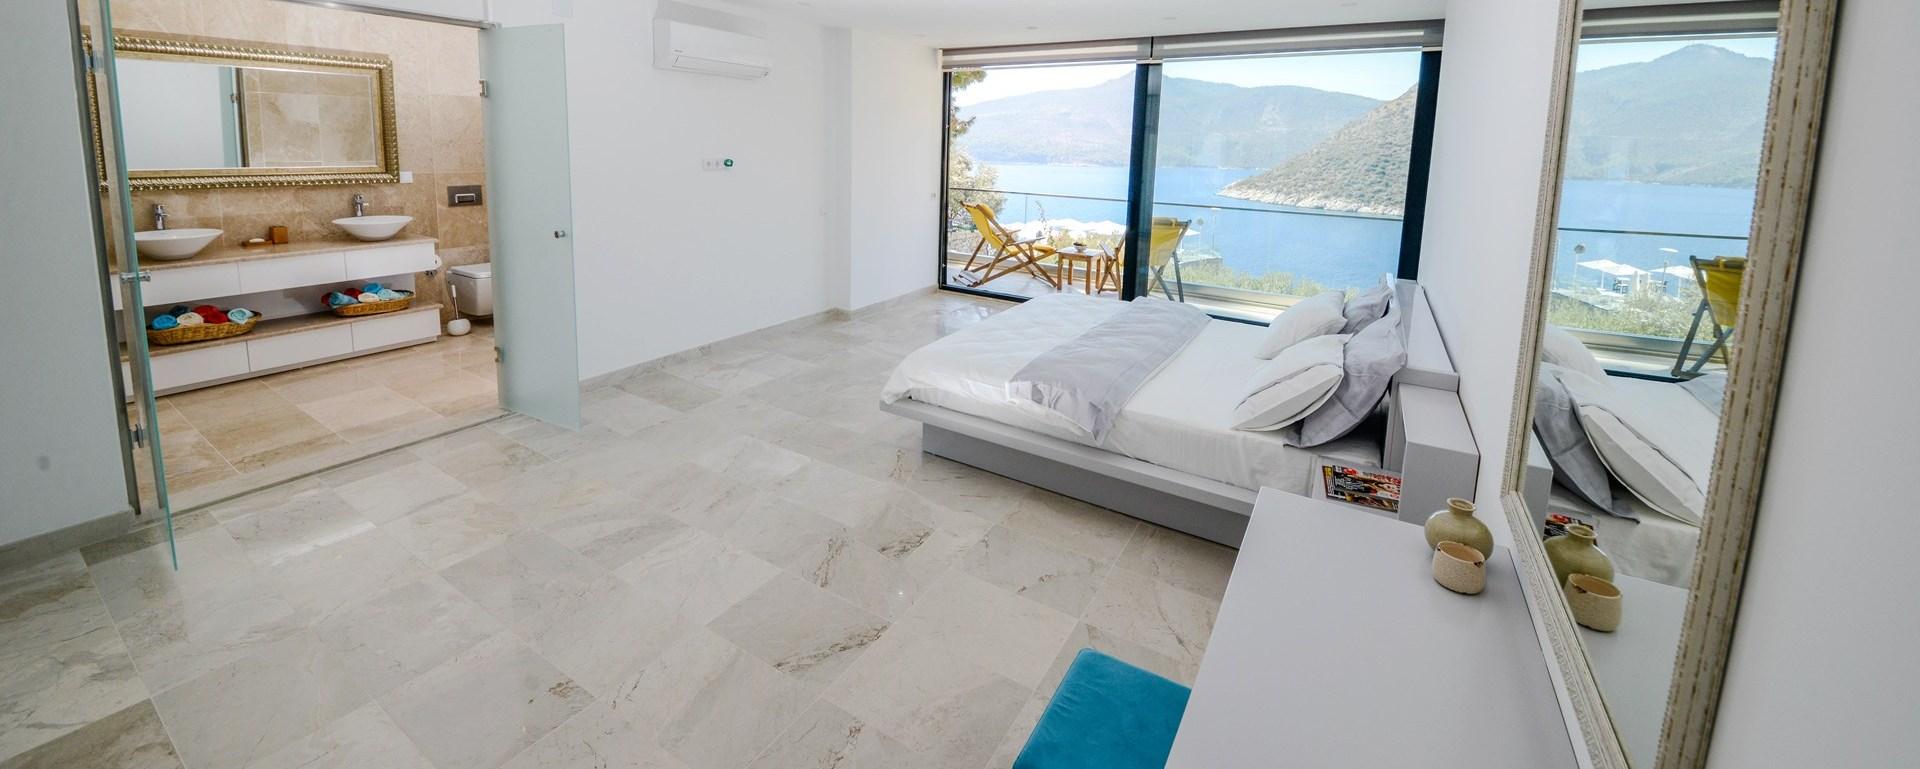 villa-kalamar-double-bedroom1